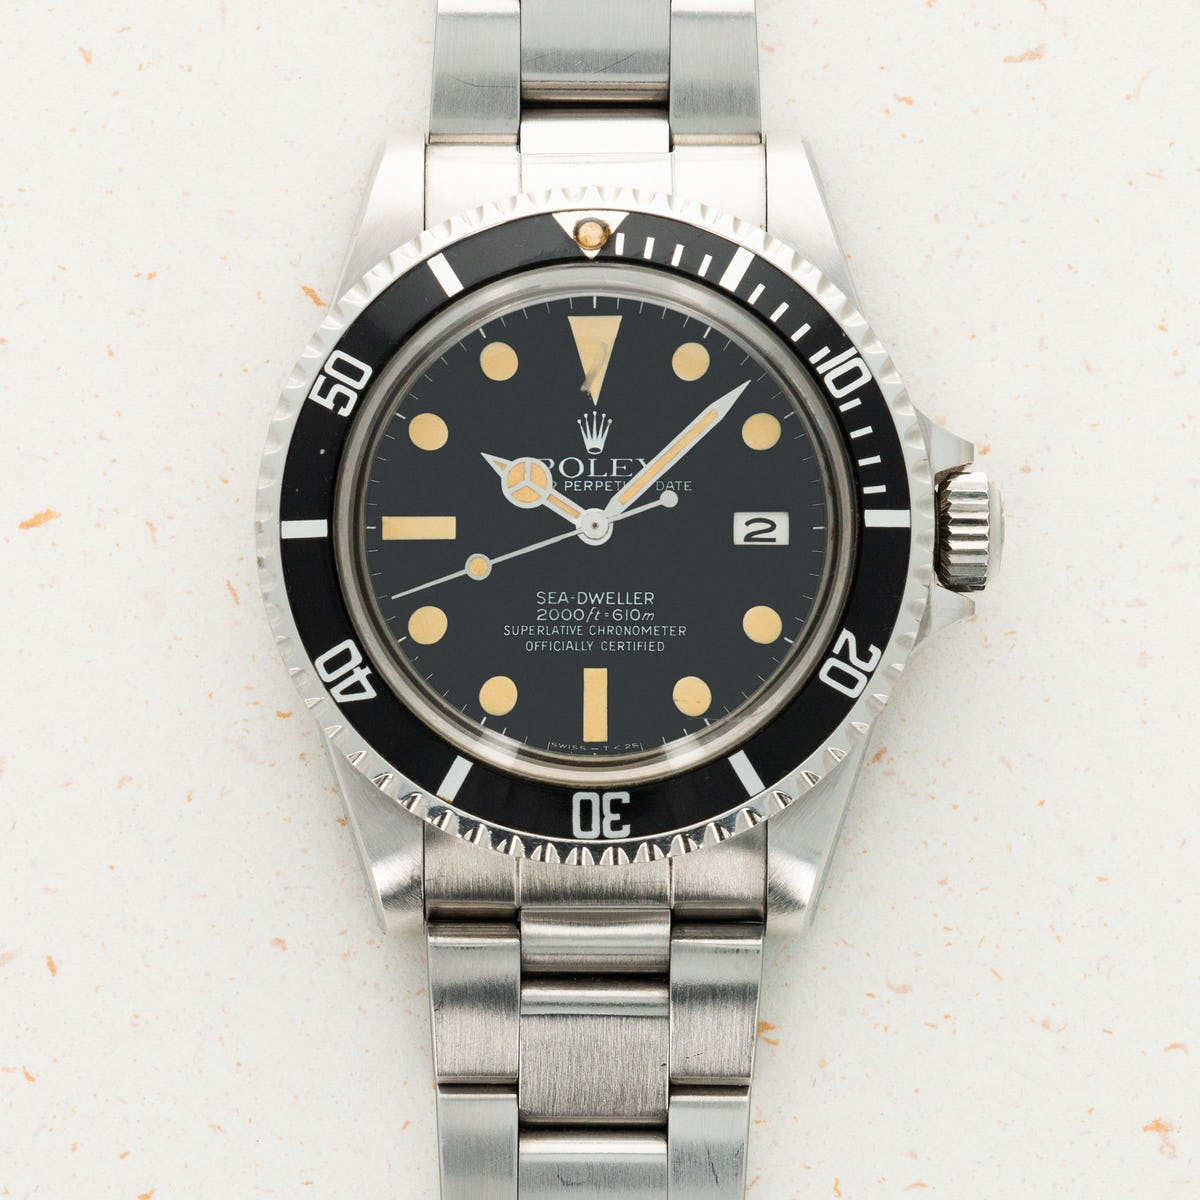 Thumbnail for Rolex Sea-Dweller Great White 1665